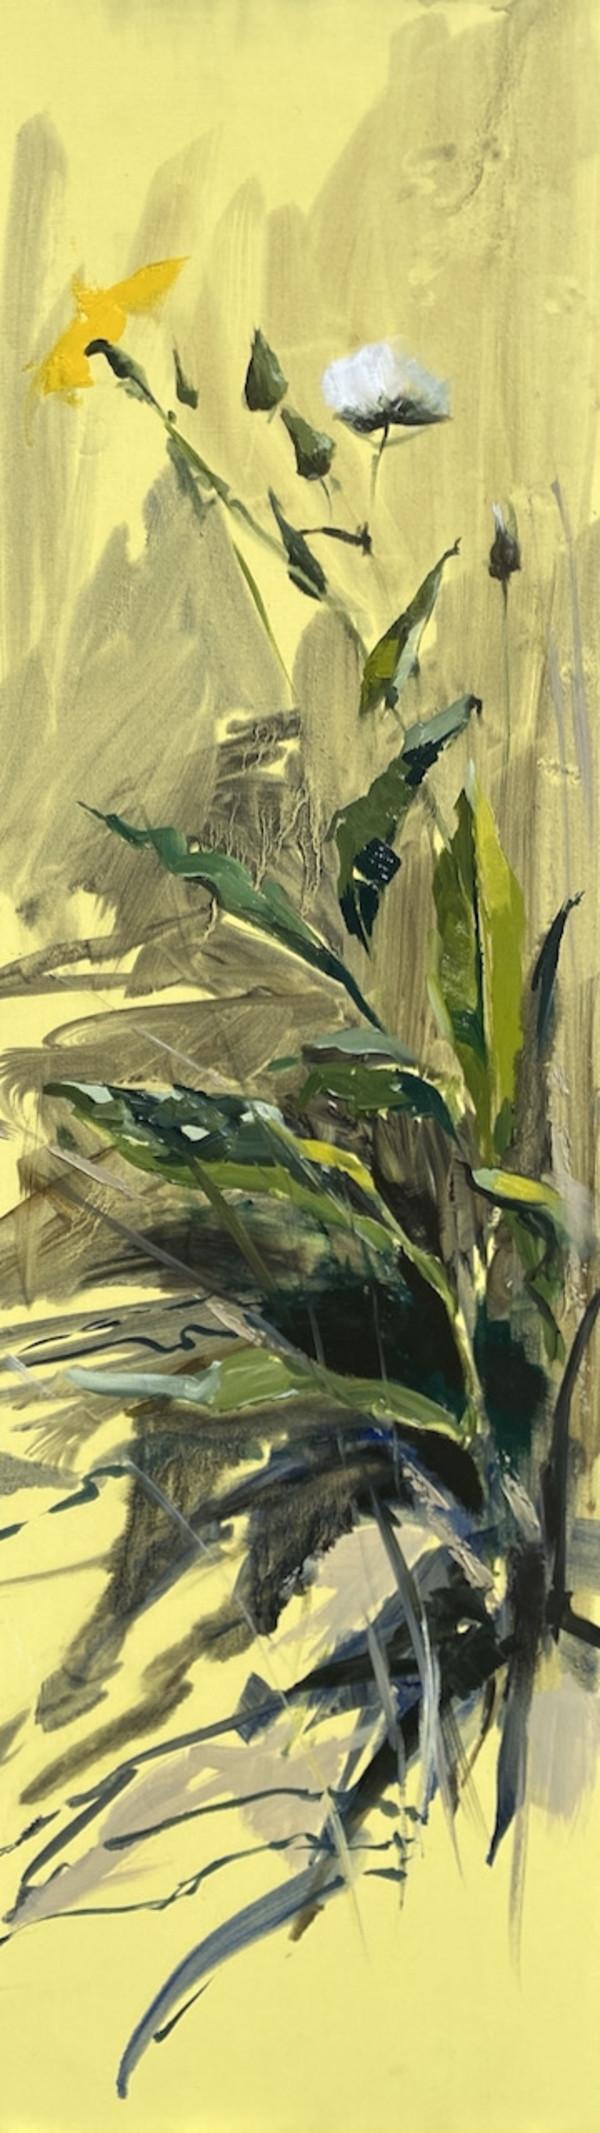 Melkdistel by Philine van der Vegte